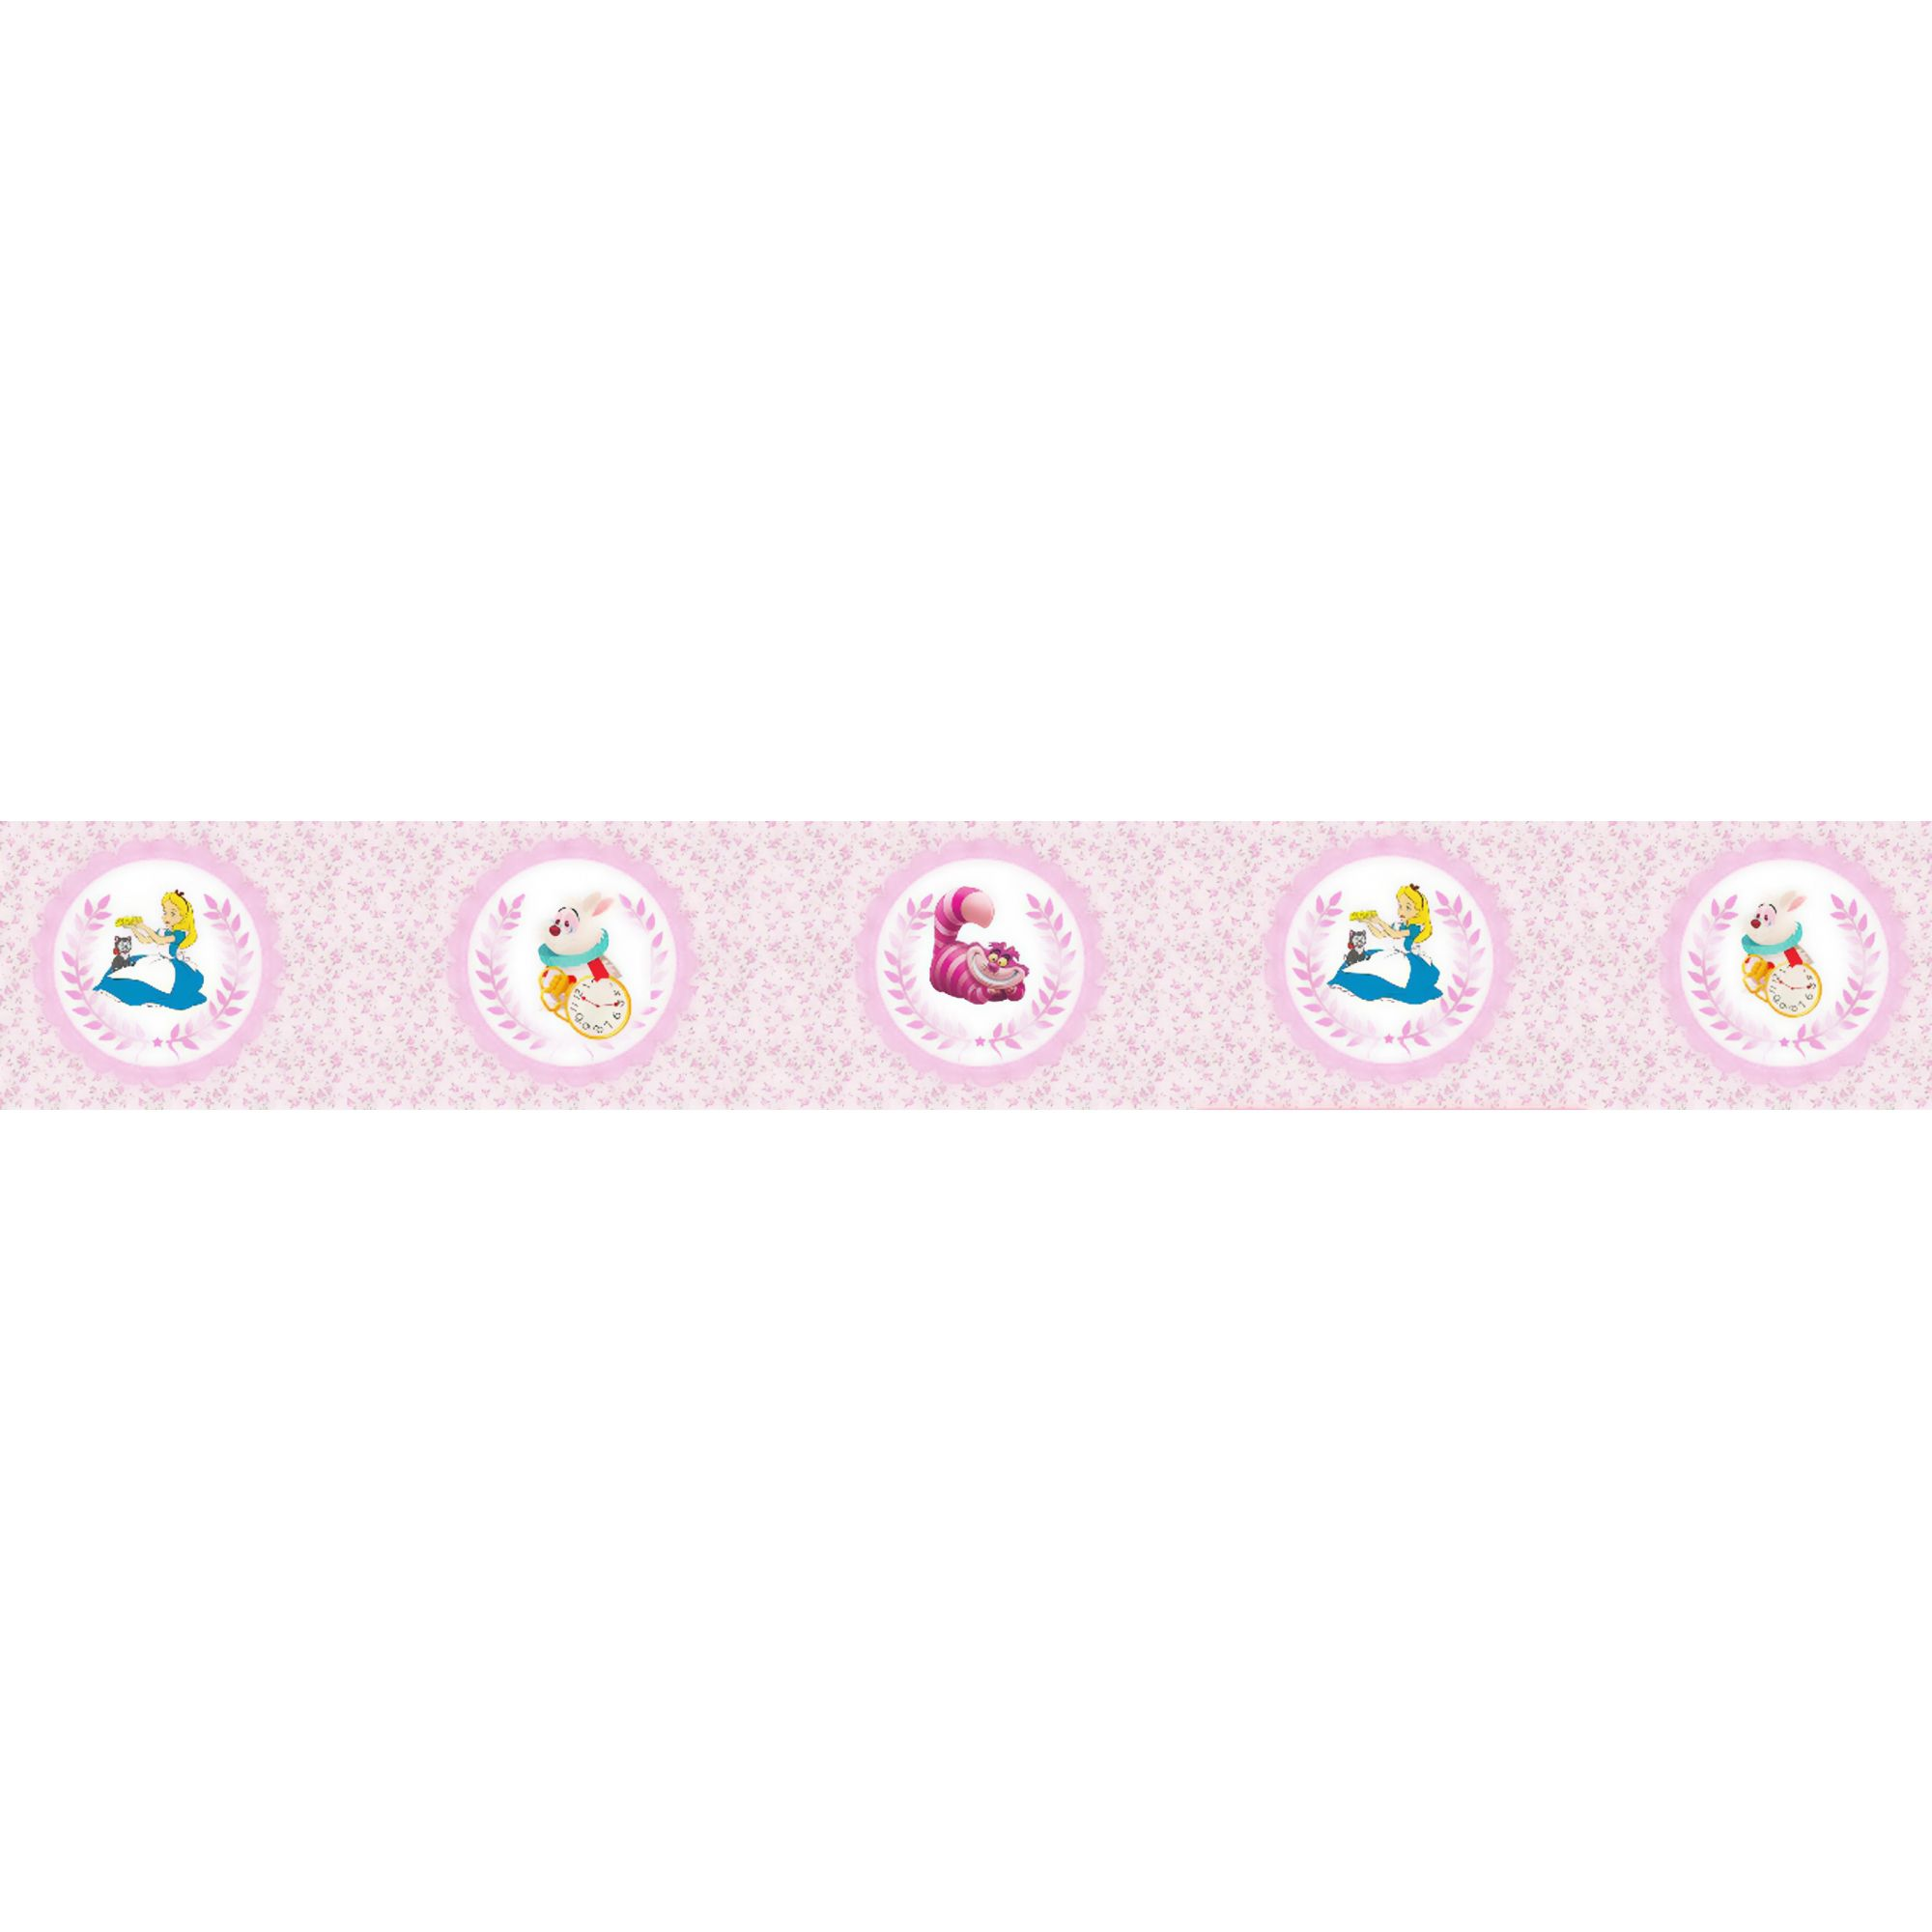 Faixa Decorativa Adesiva Alice no Pais das Maravilhas 2  - Final Decor